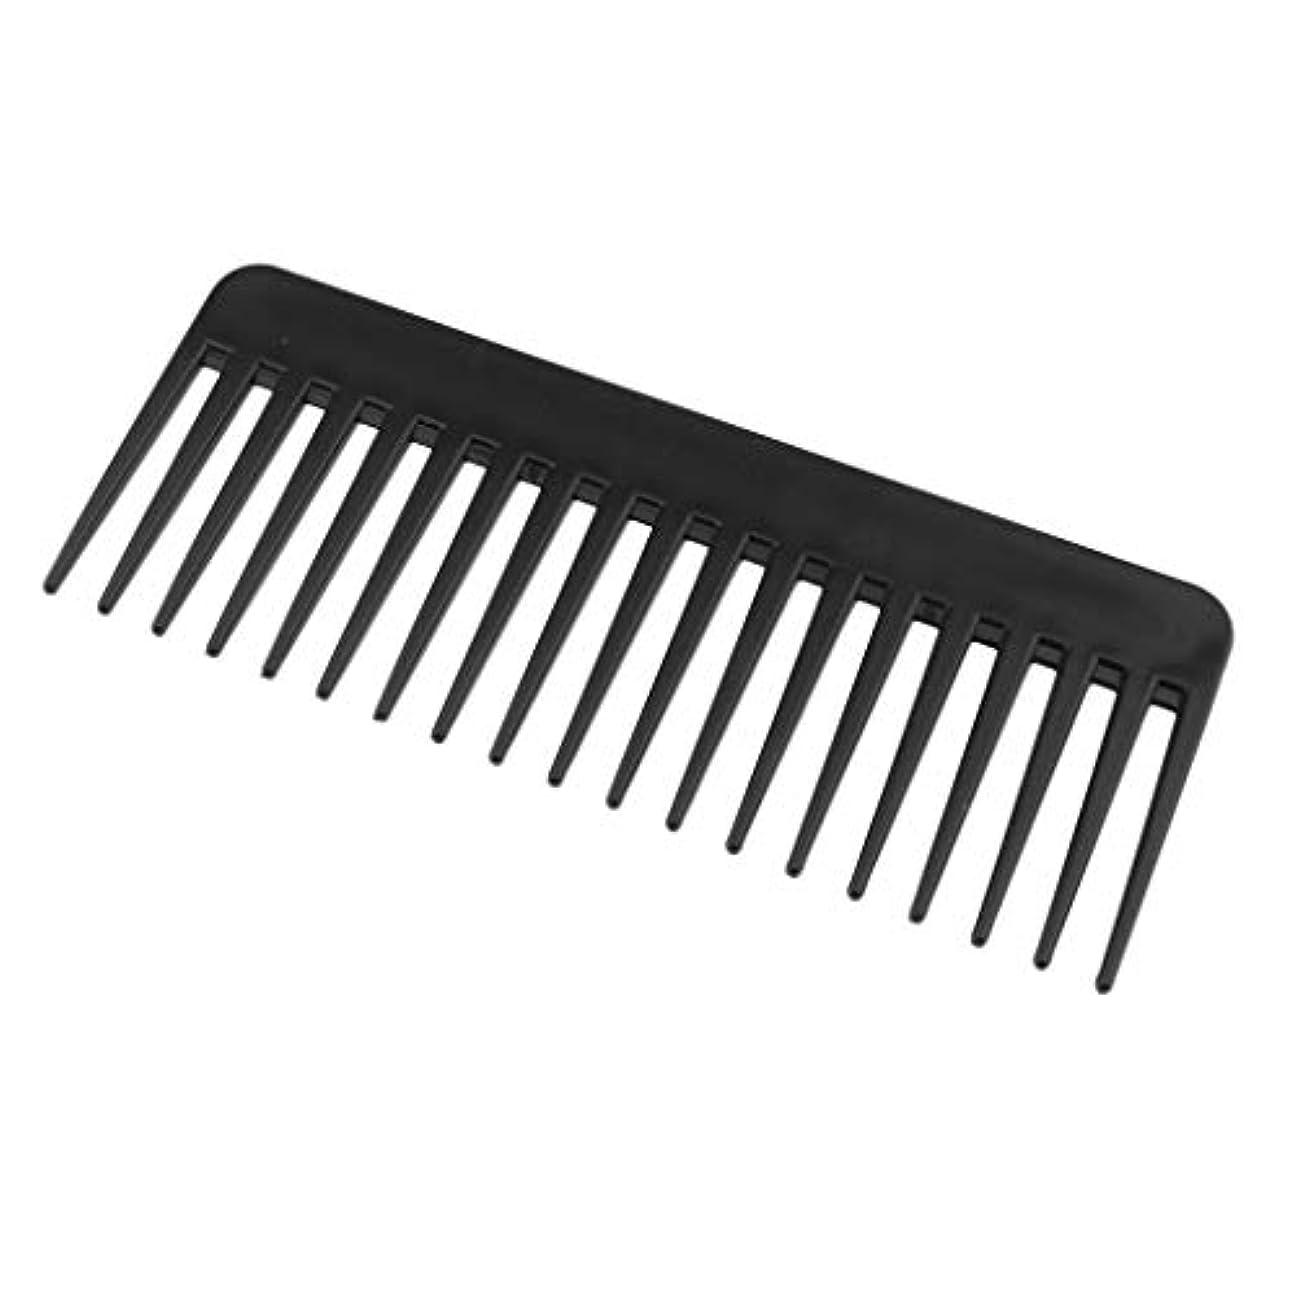 F Fityle 帯電防止くし プラスチック製 ヘアブラシ 丈夫 3色選べ - ブラック